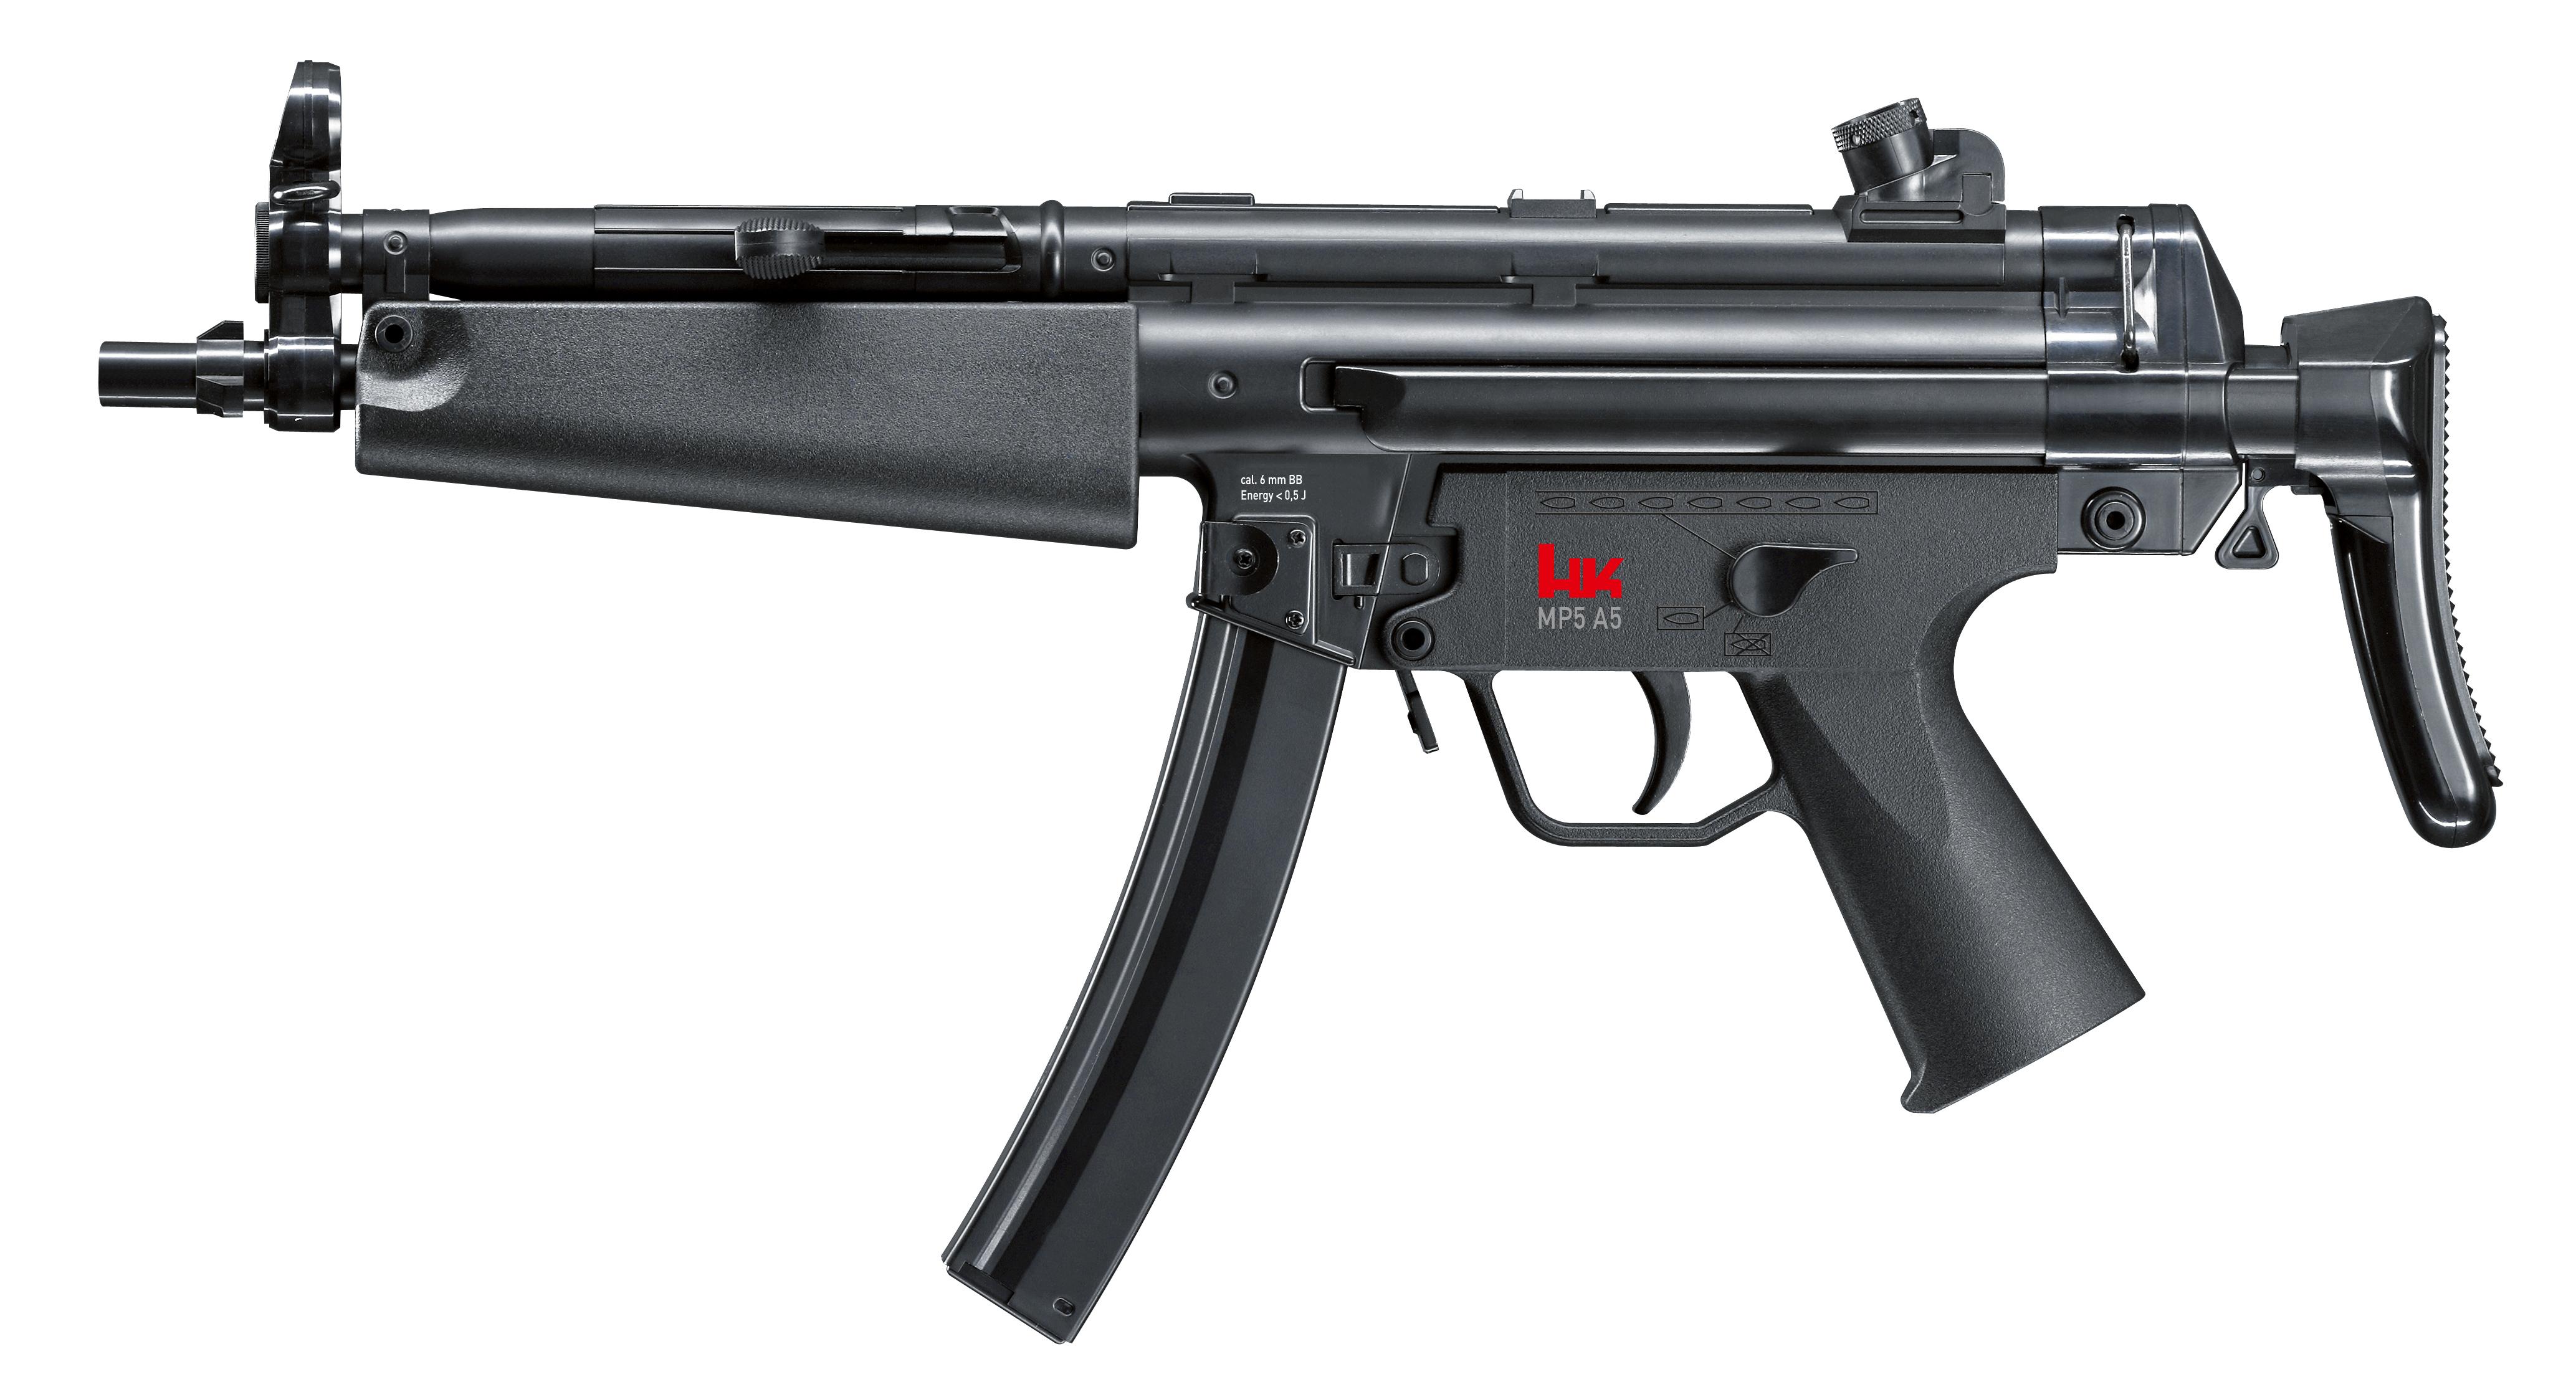 HECKLER & KOCH (Umarex) Airsoft AEG MP5 A5 EBB